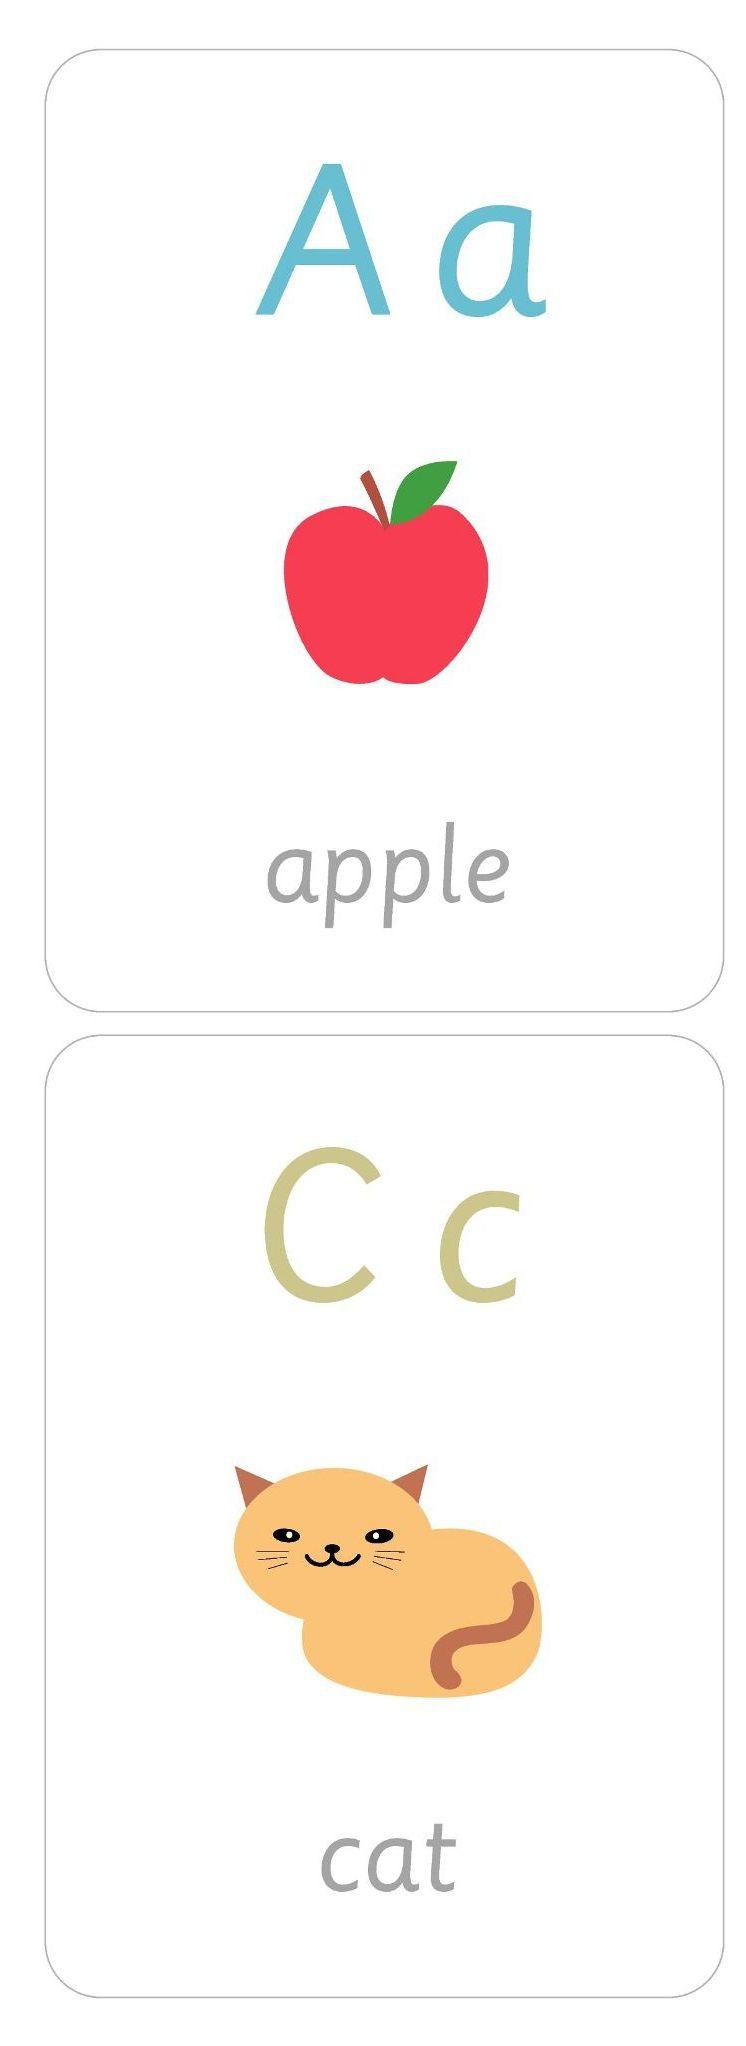 C:\Users\Andrey\AppData\Local\Microsoft\Windows\Temporary Internet Files\Content.Word\18.-bukvy-anglijskogo-alfavita-v-kartinkax.jpg